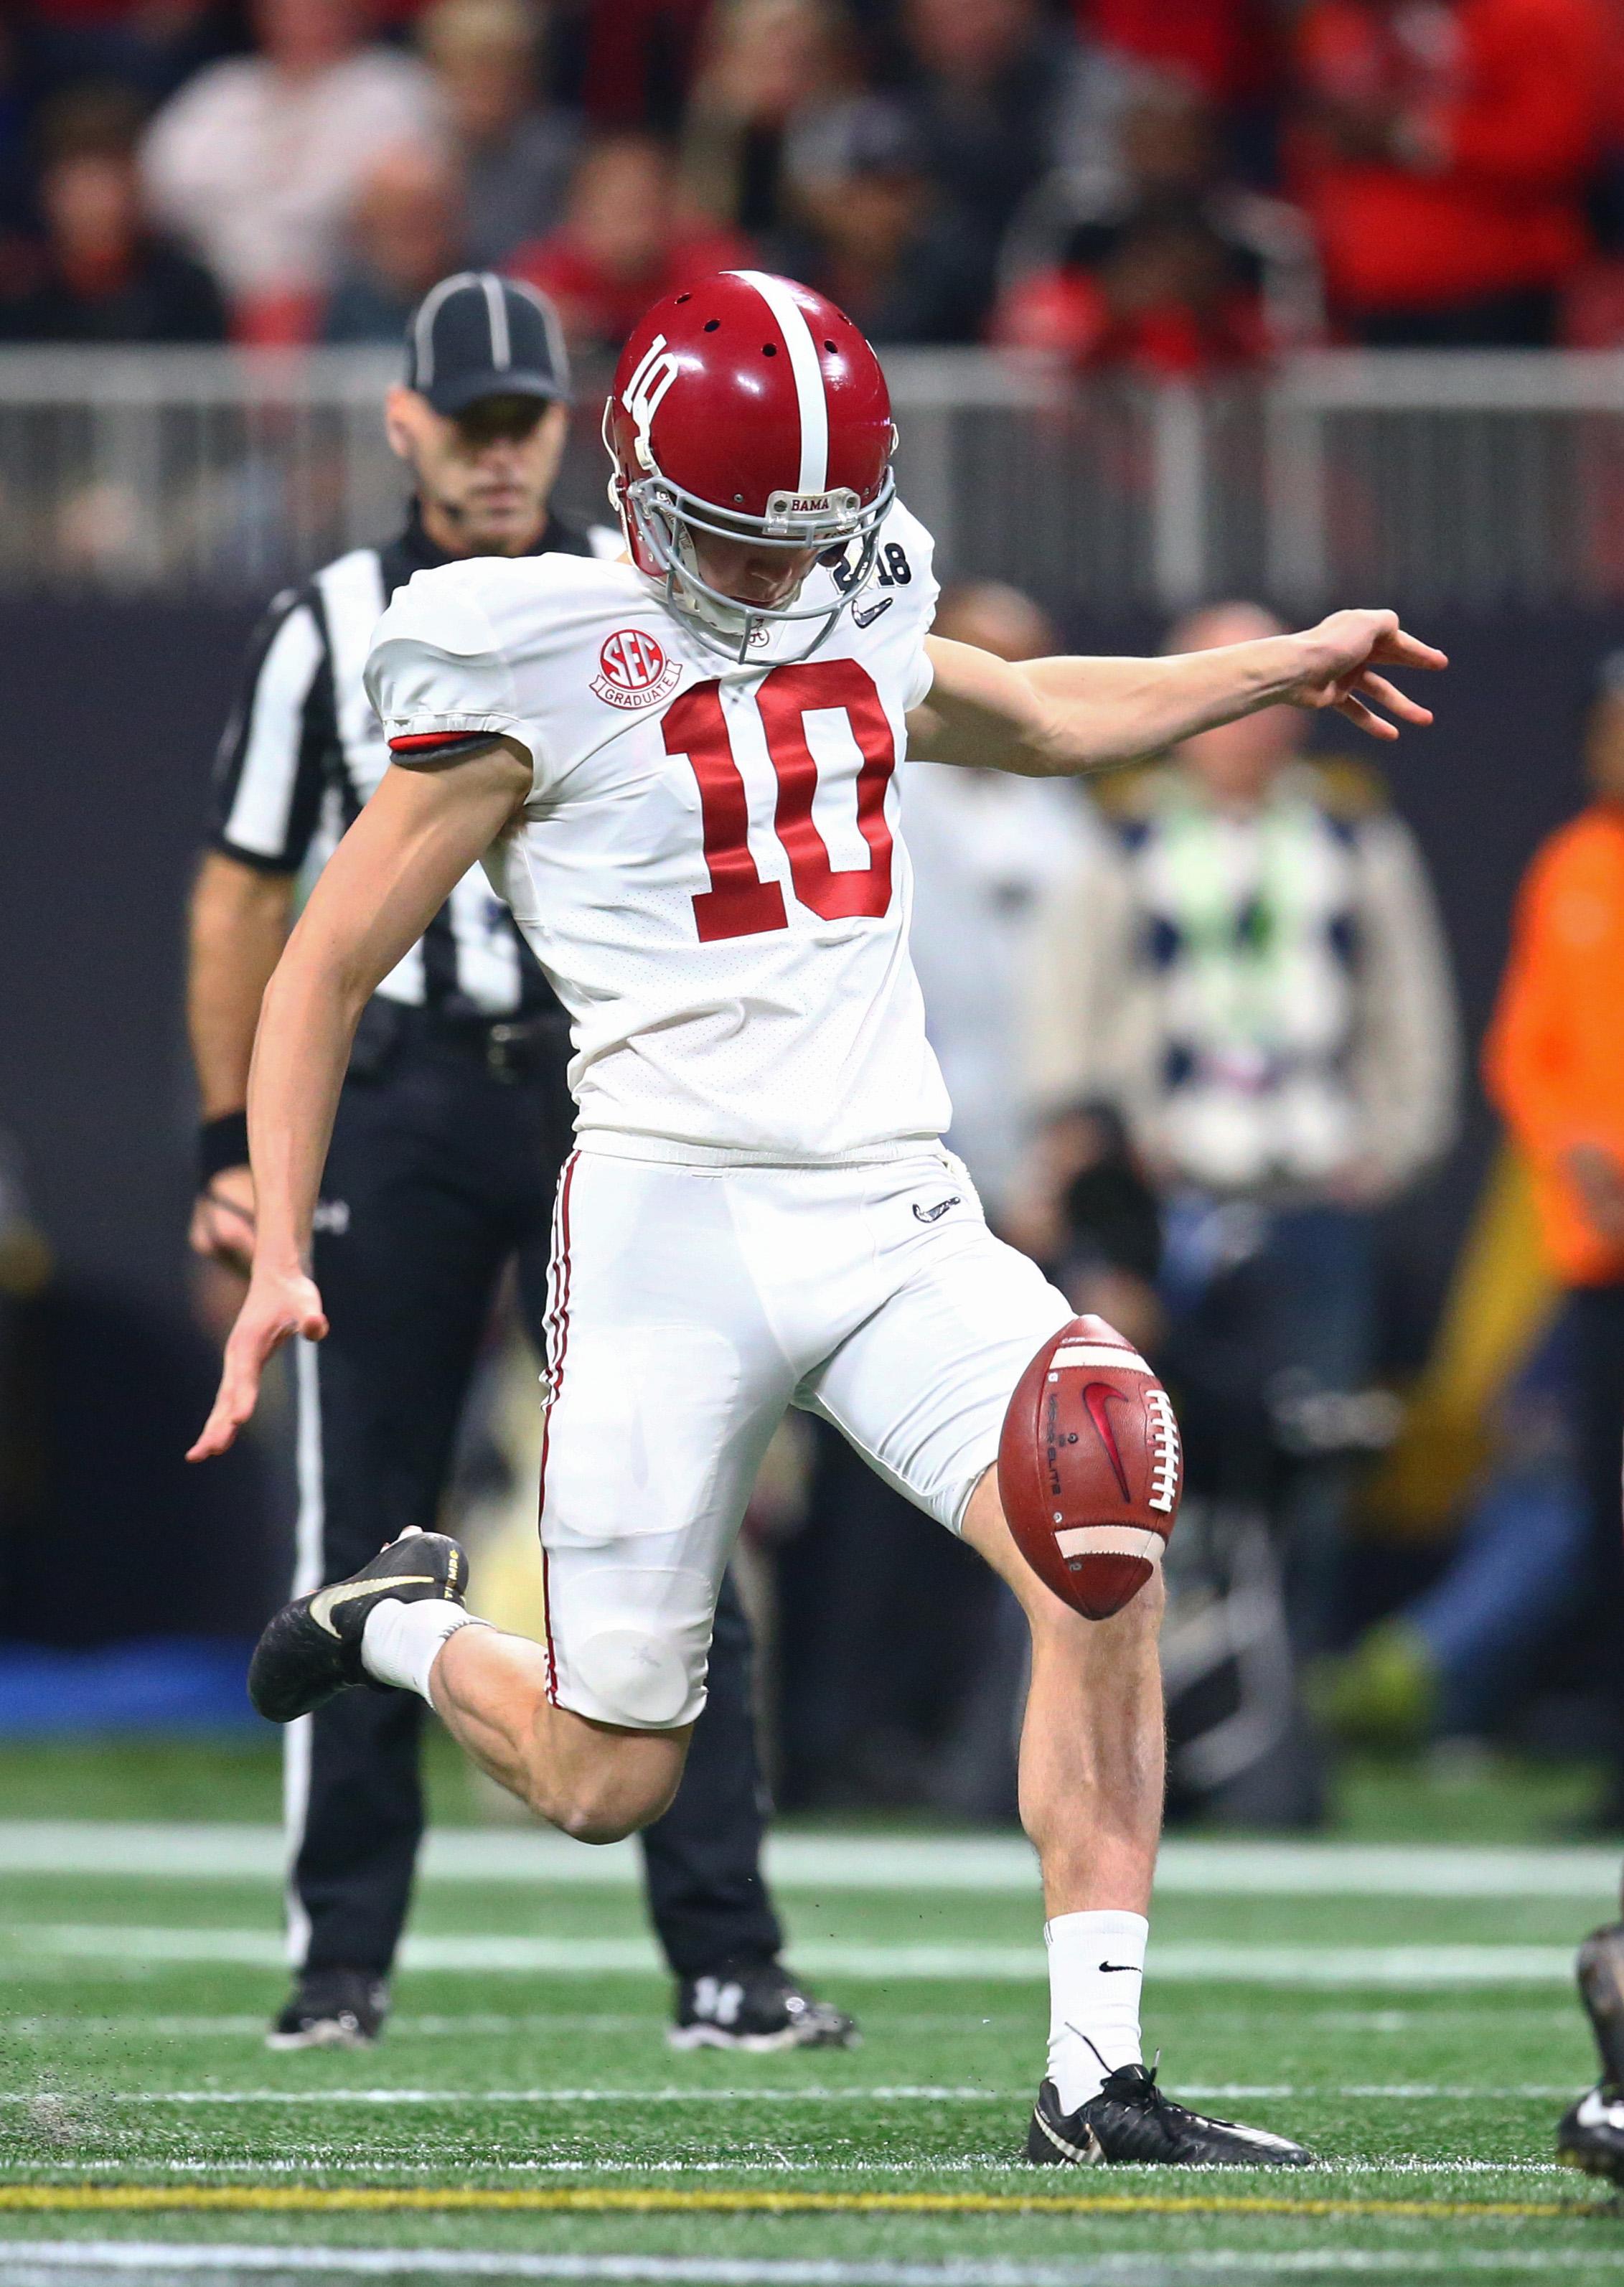 NCAA Football: CFP National Championship Game-Alabama vs Georgia